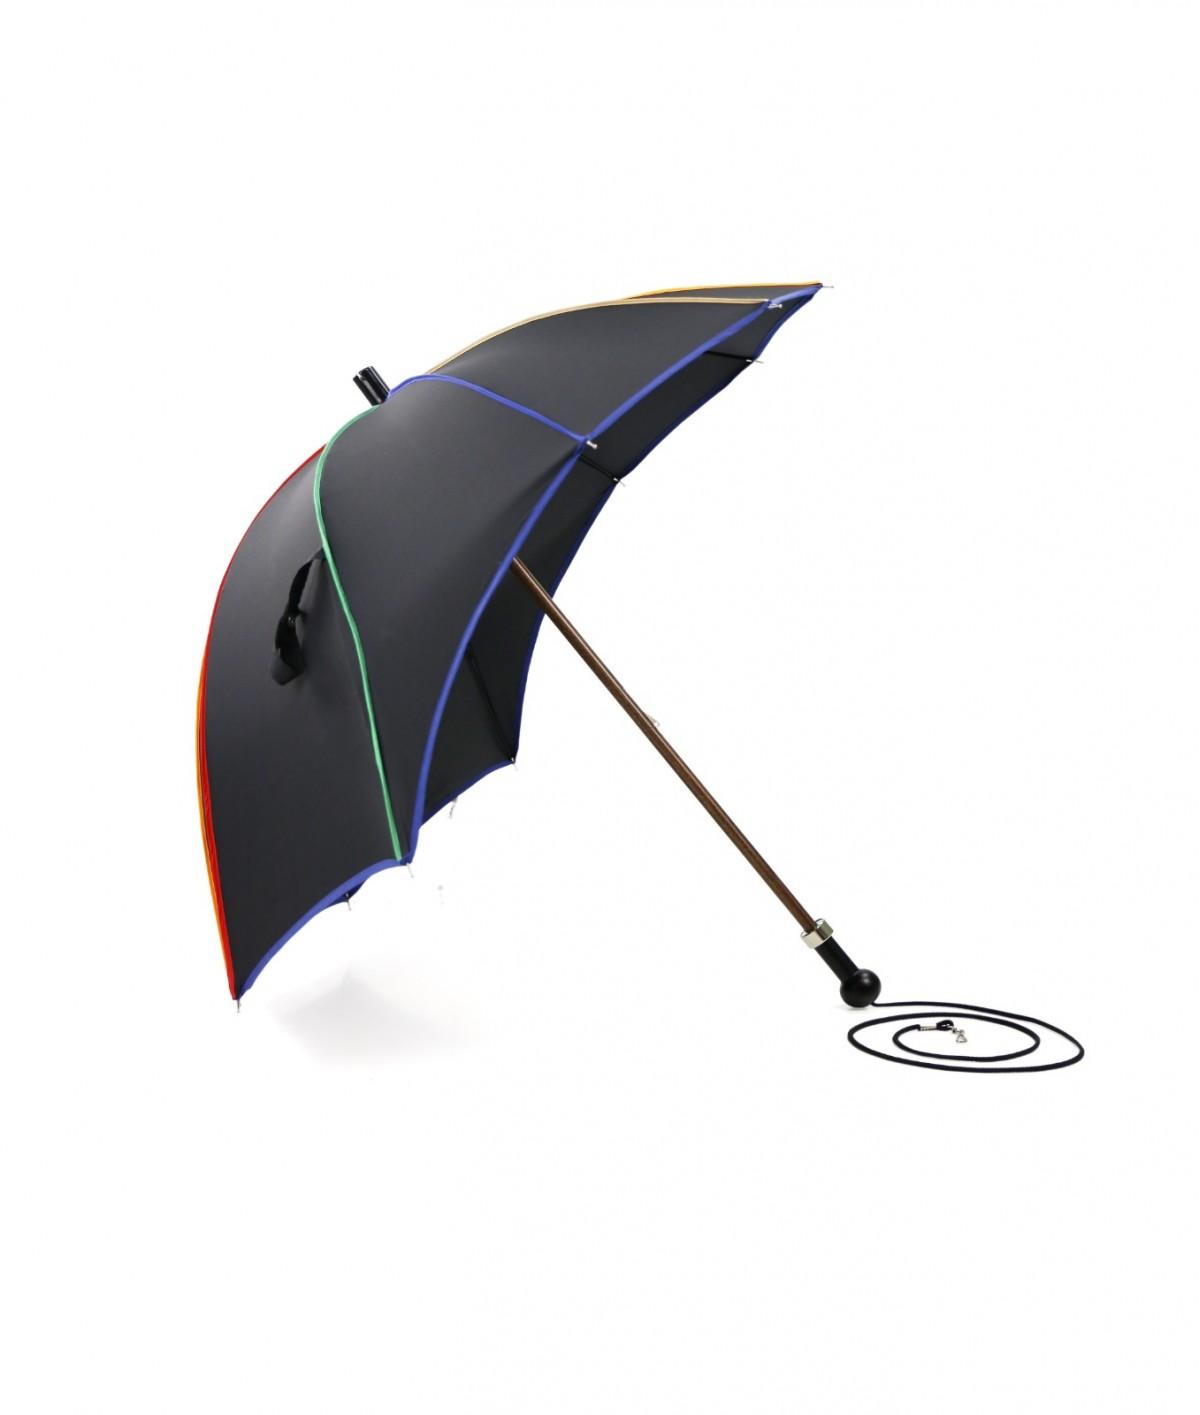 →  Umbrella Visor - Black - Made in France by Maison Pierre Vaux - Umbrella's Manufacturer